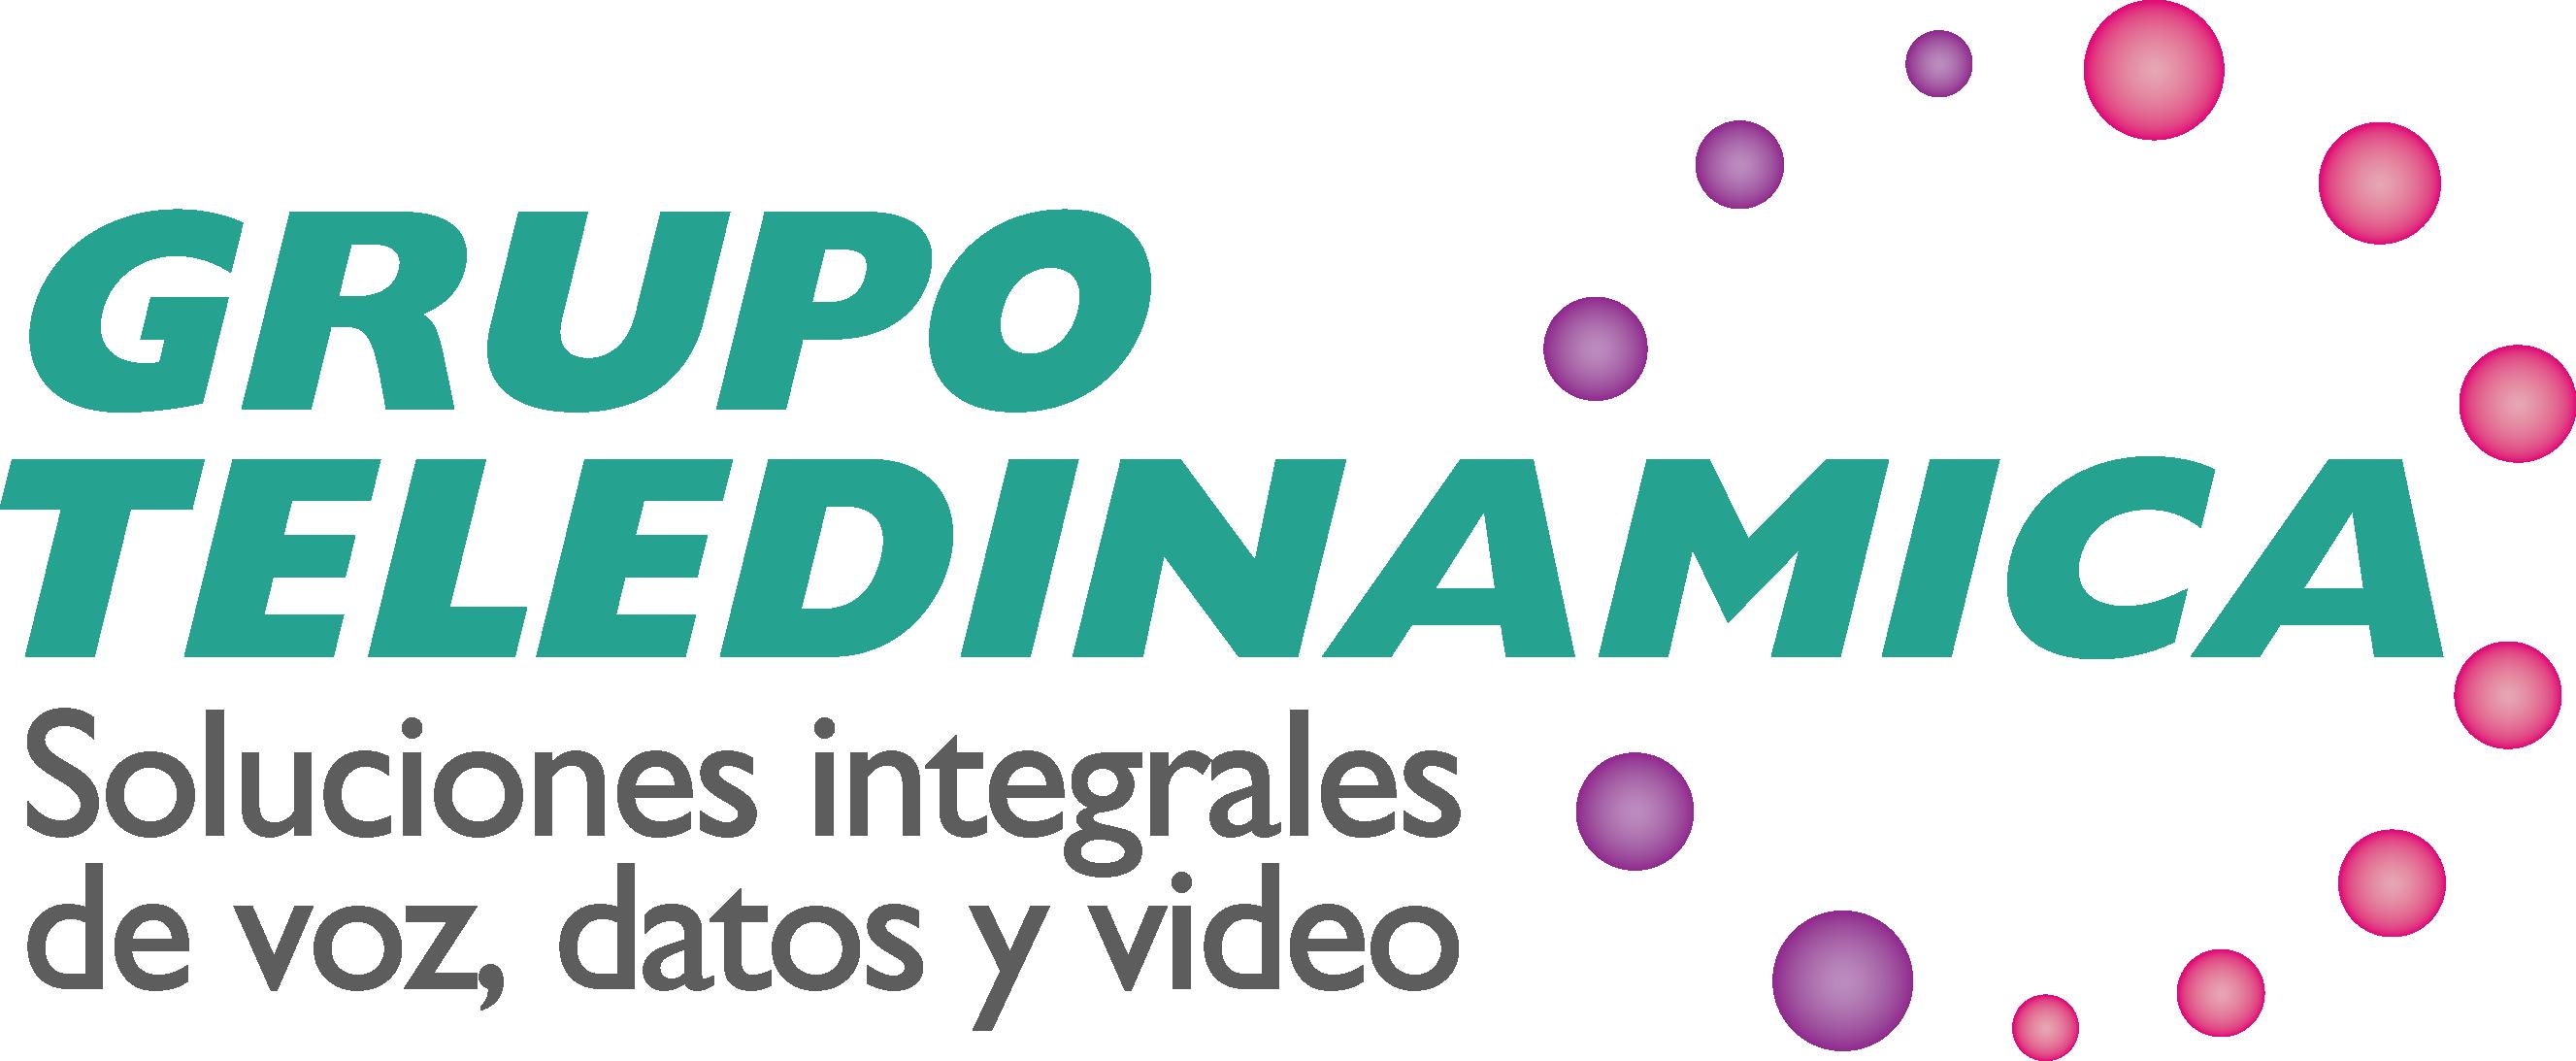 Grupo Teledinámica